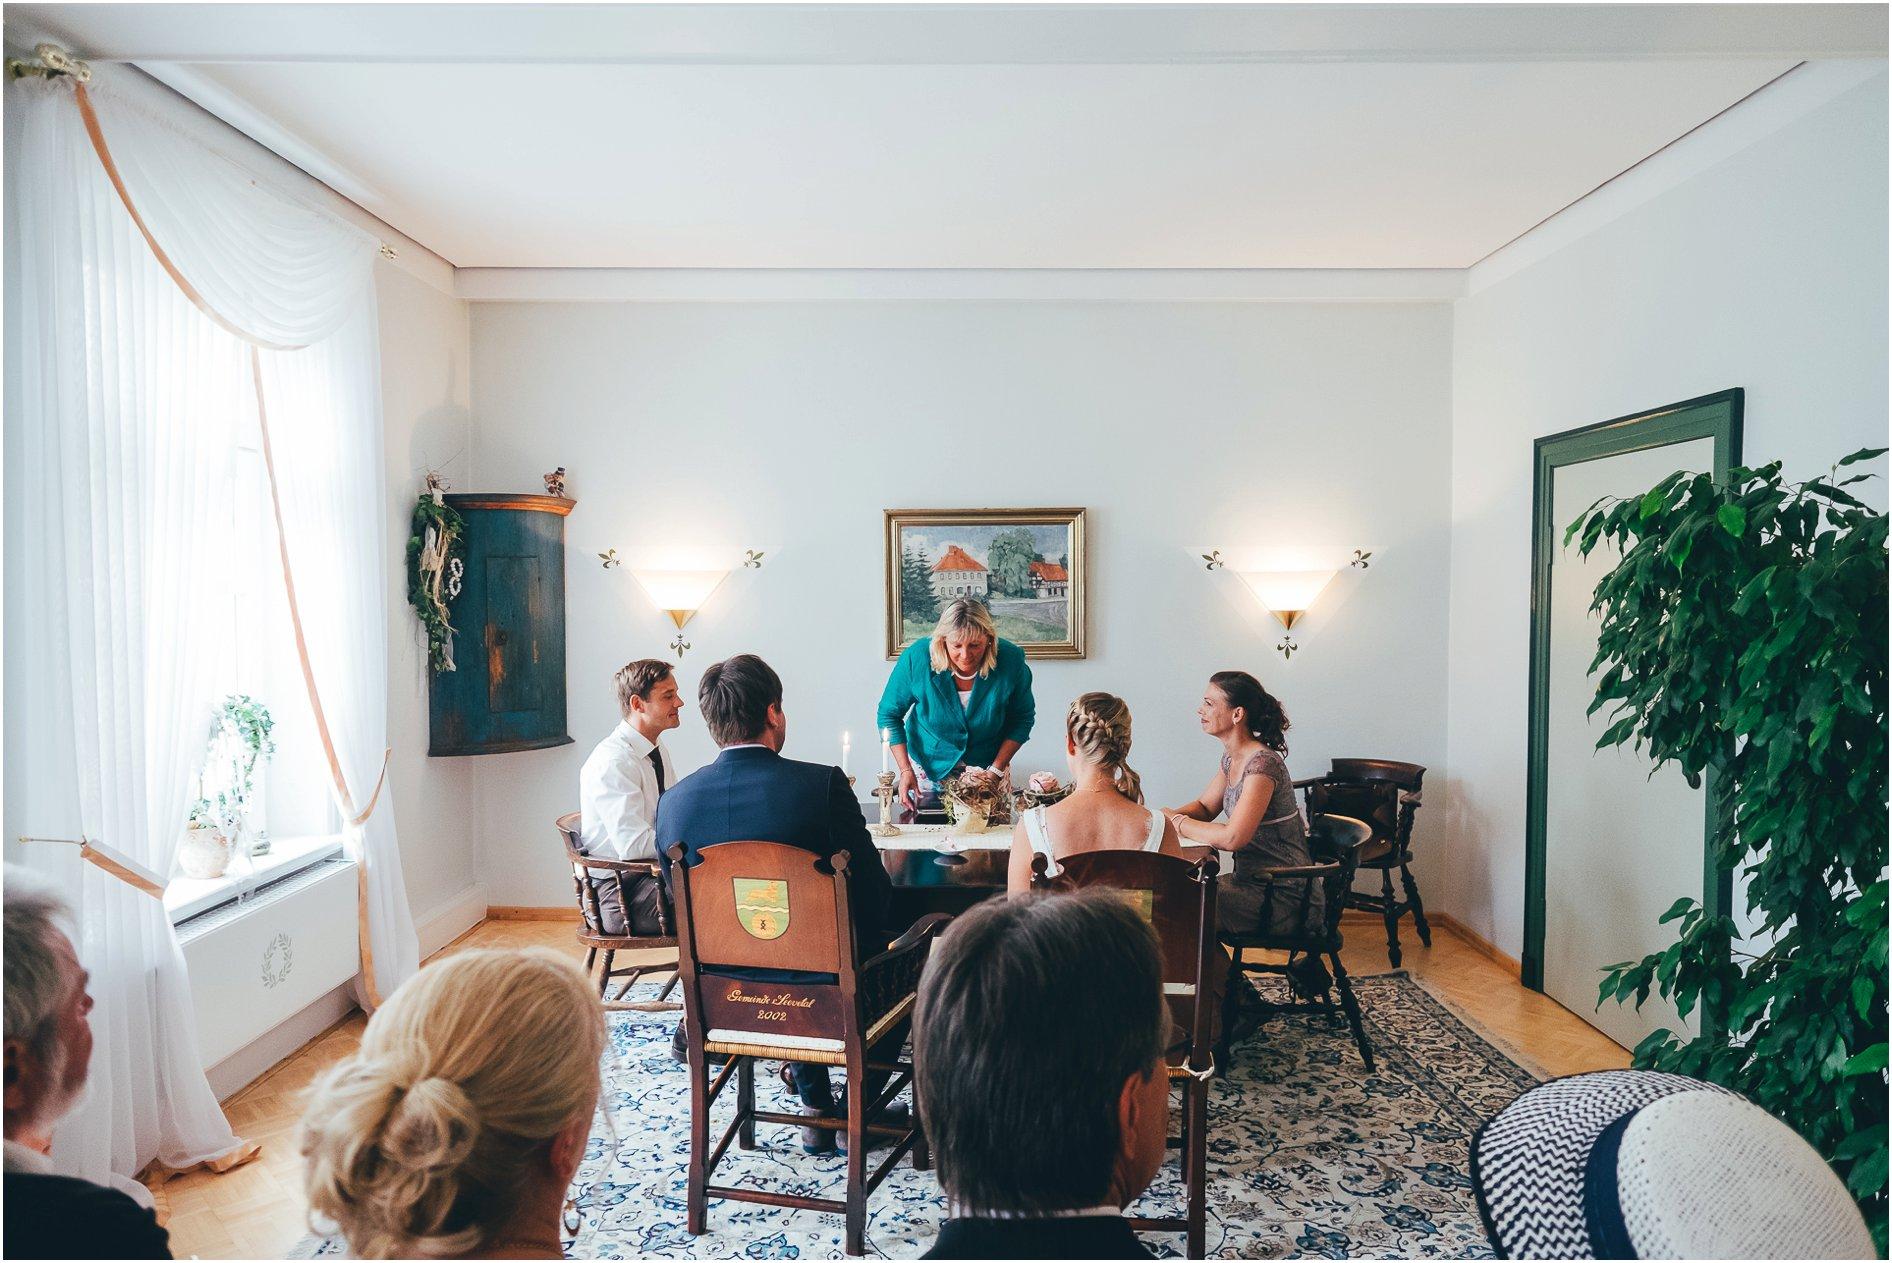 2016-04-19_0024 Sandra & Janis - Hochzeitsfotograf in Seevetal